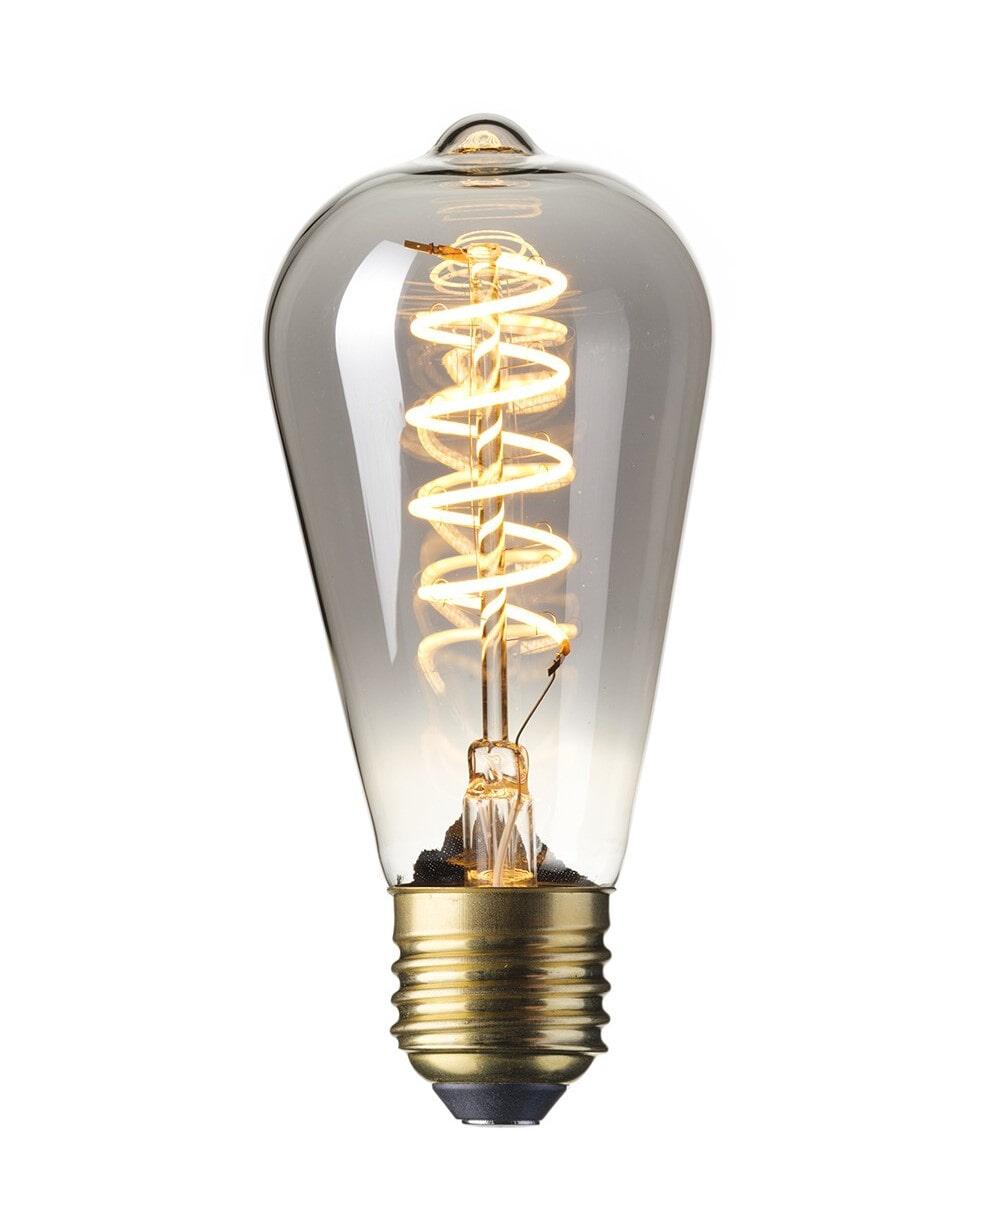 Spiraallamp 'Peer' E27 LED 4W Titanium Rustic 14cm, dimbaar